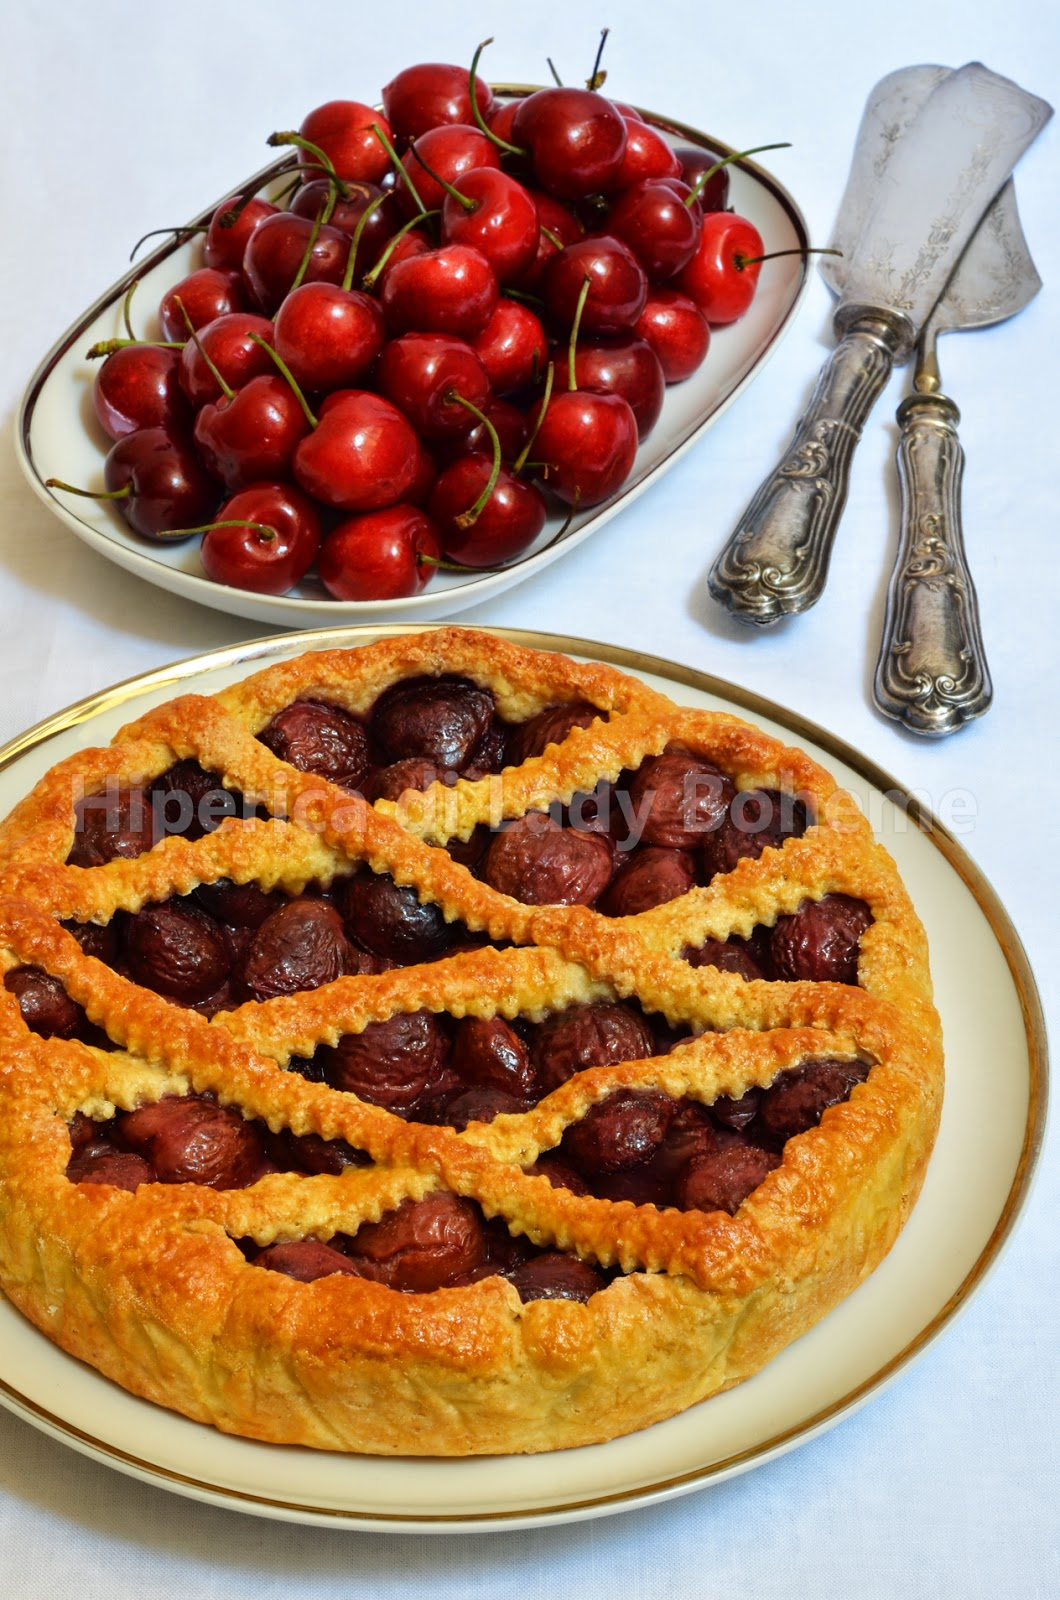 hiperica_lady_boheme_blog_cucina_ricette_gustose_facili_veloci_crostata_di_ciliegie_fresche_1